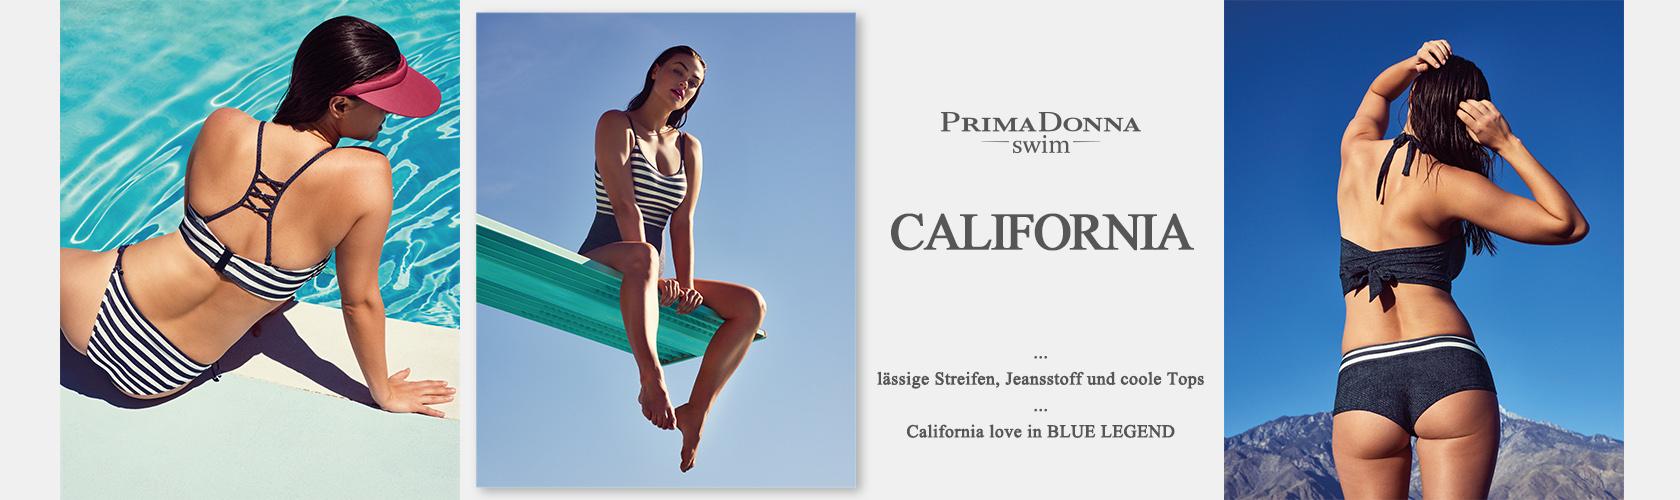 Slideshow CALIFORNIA BLL 20.02.